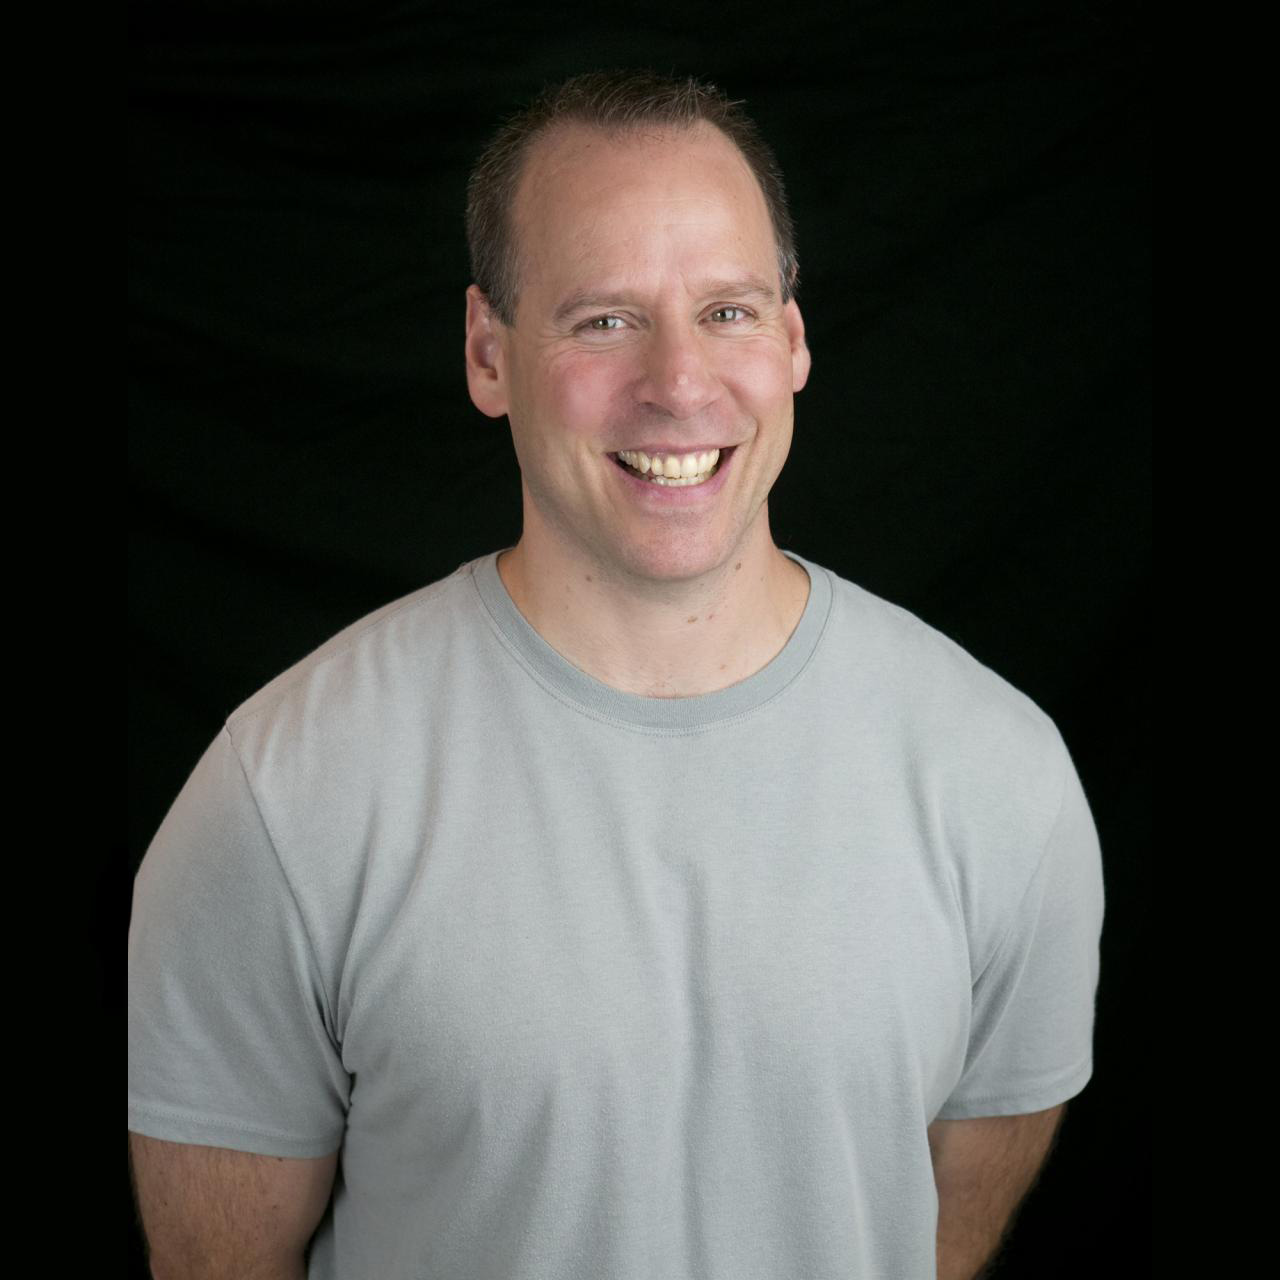 Eric Lemkin